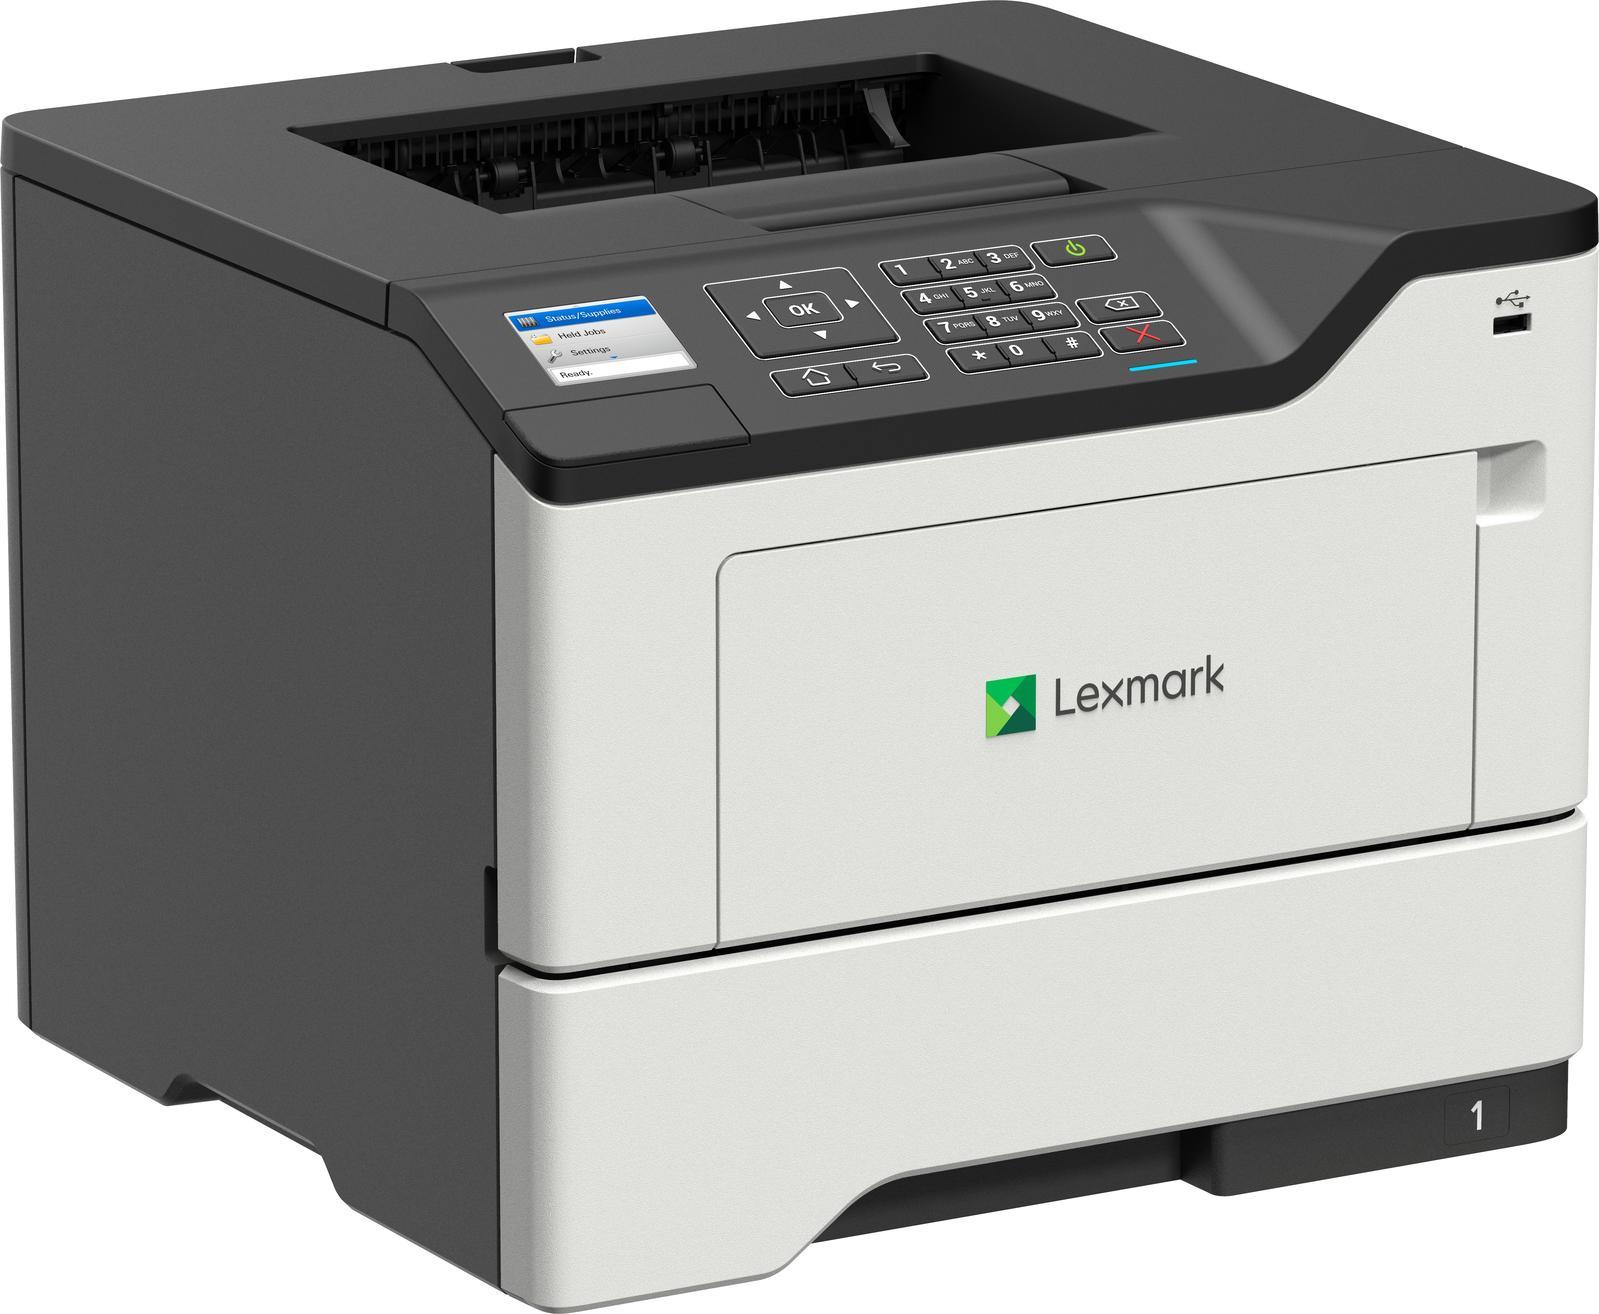 Lexmark B2650dw Monolaserdrucker (A4, 1200x1200dpi, 47S/min, 650 Blatt, Duplexdruck, Farbdisplay, WLAN, LAN, USB, Direct Print, 4J Garantie)